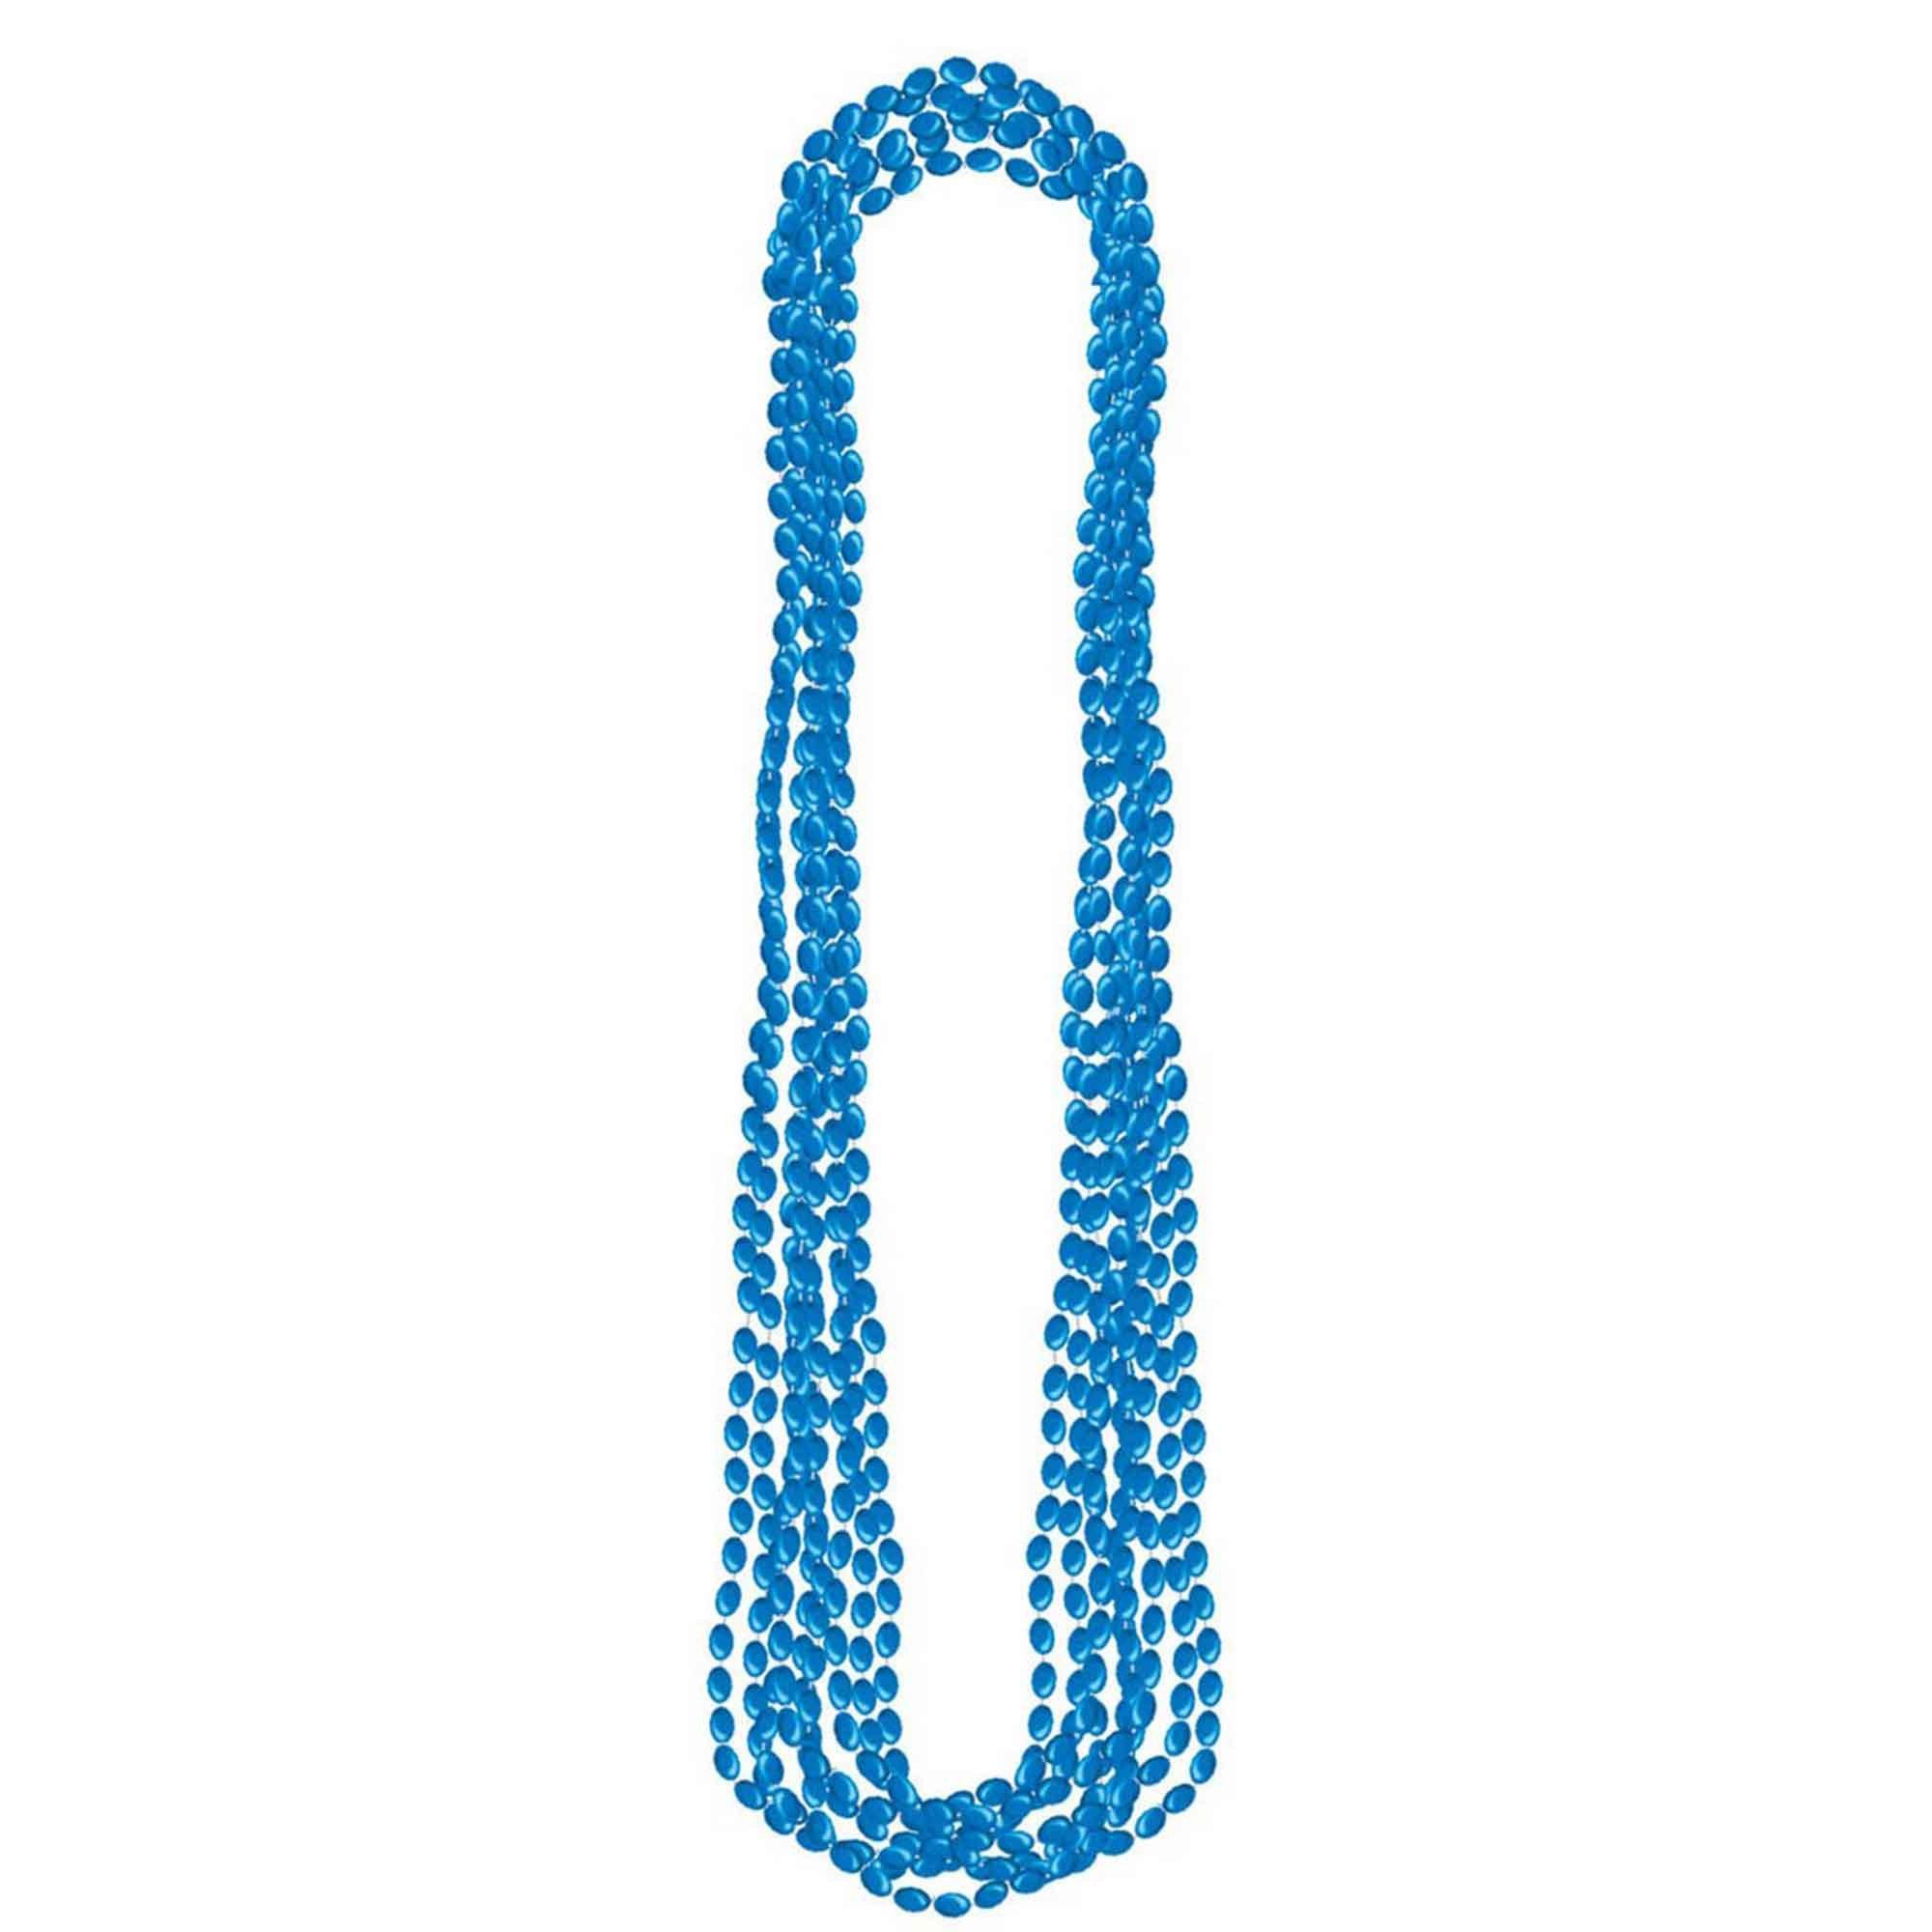 Metallic Necklace - Blue